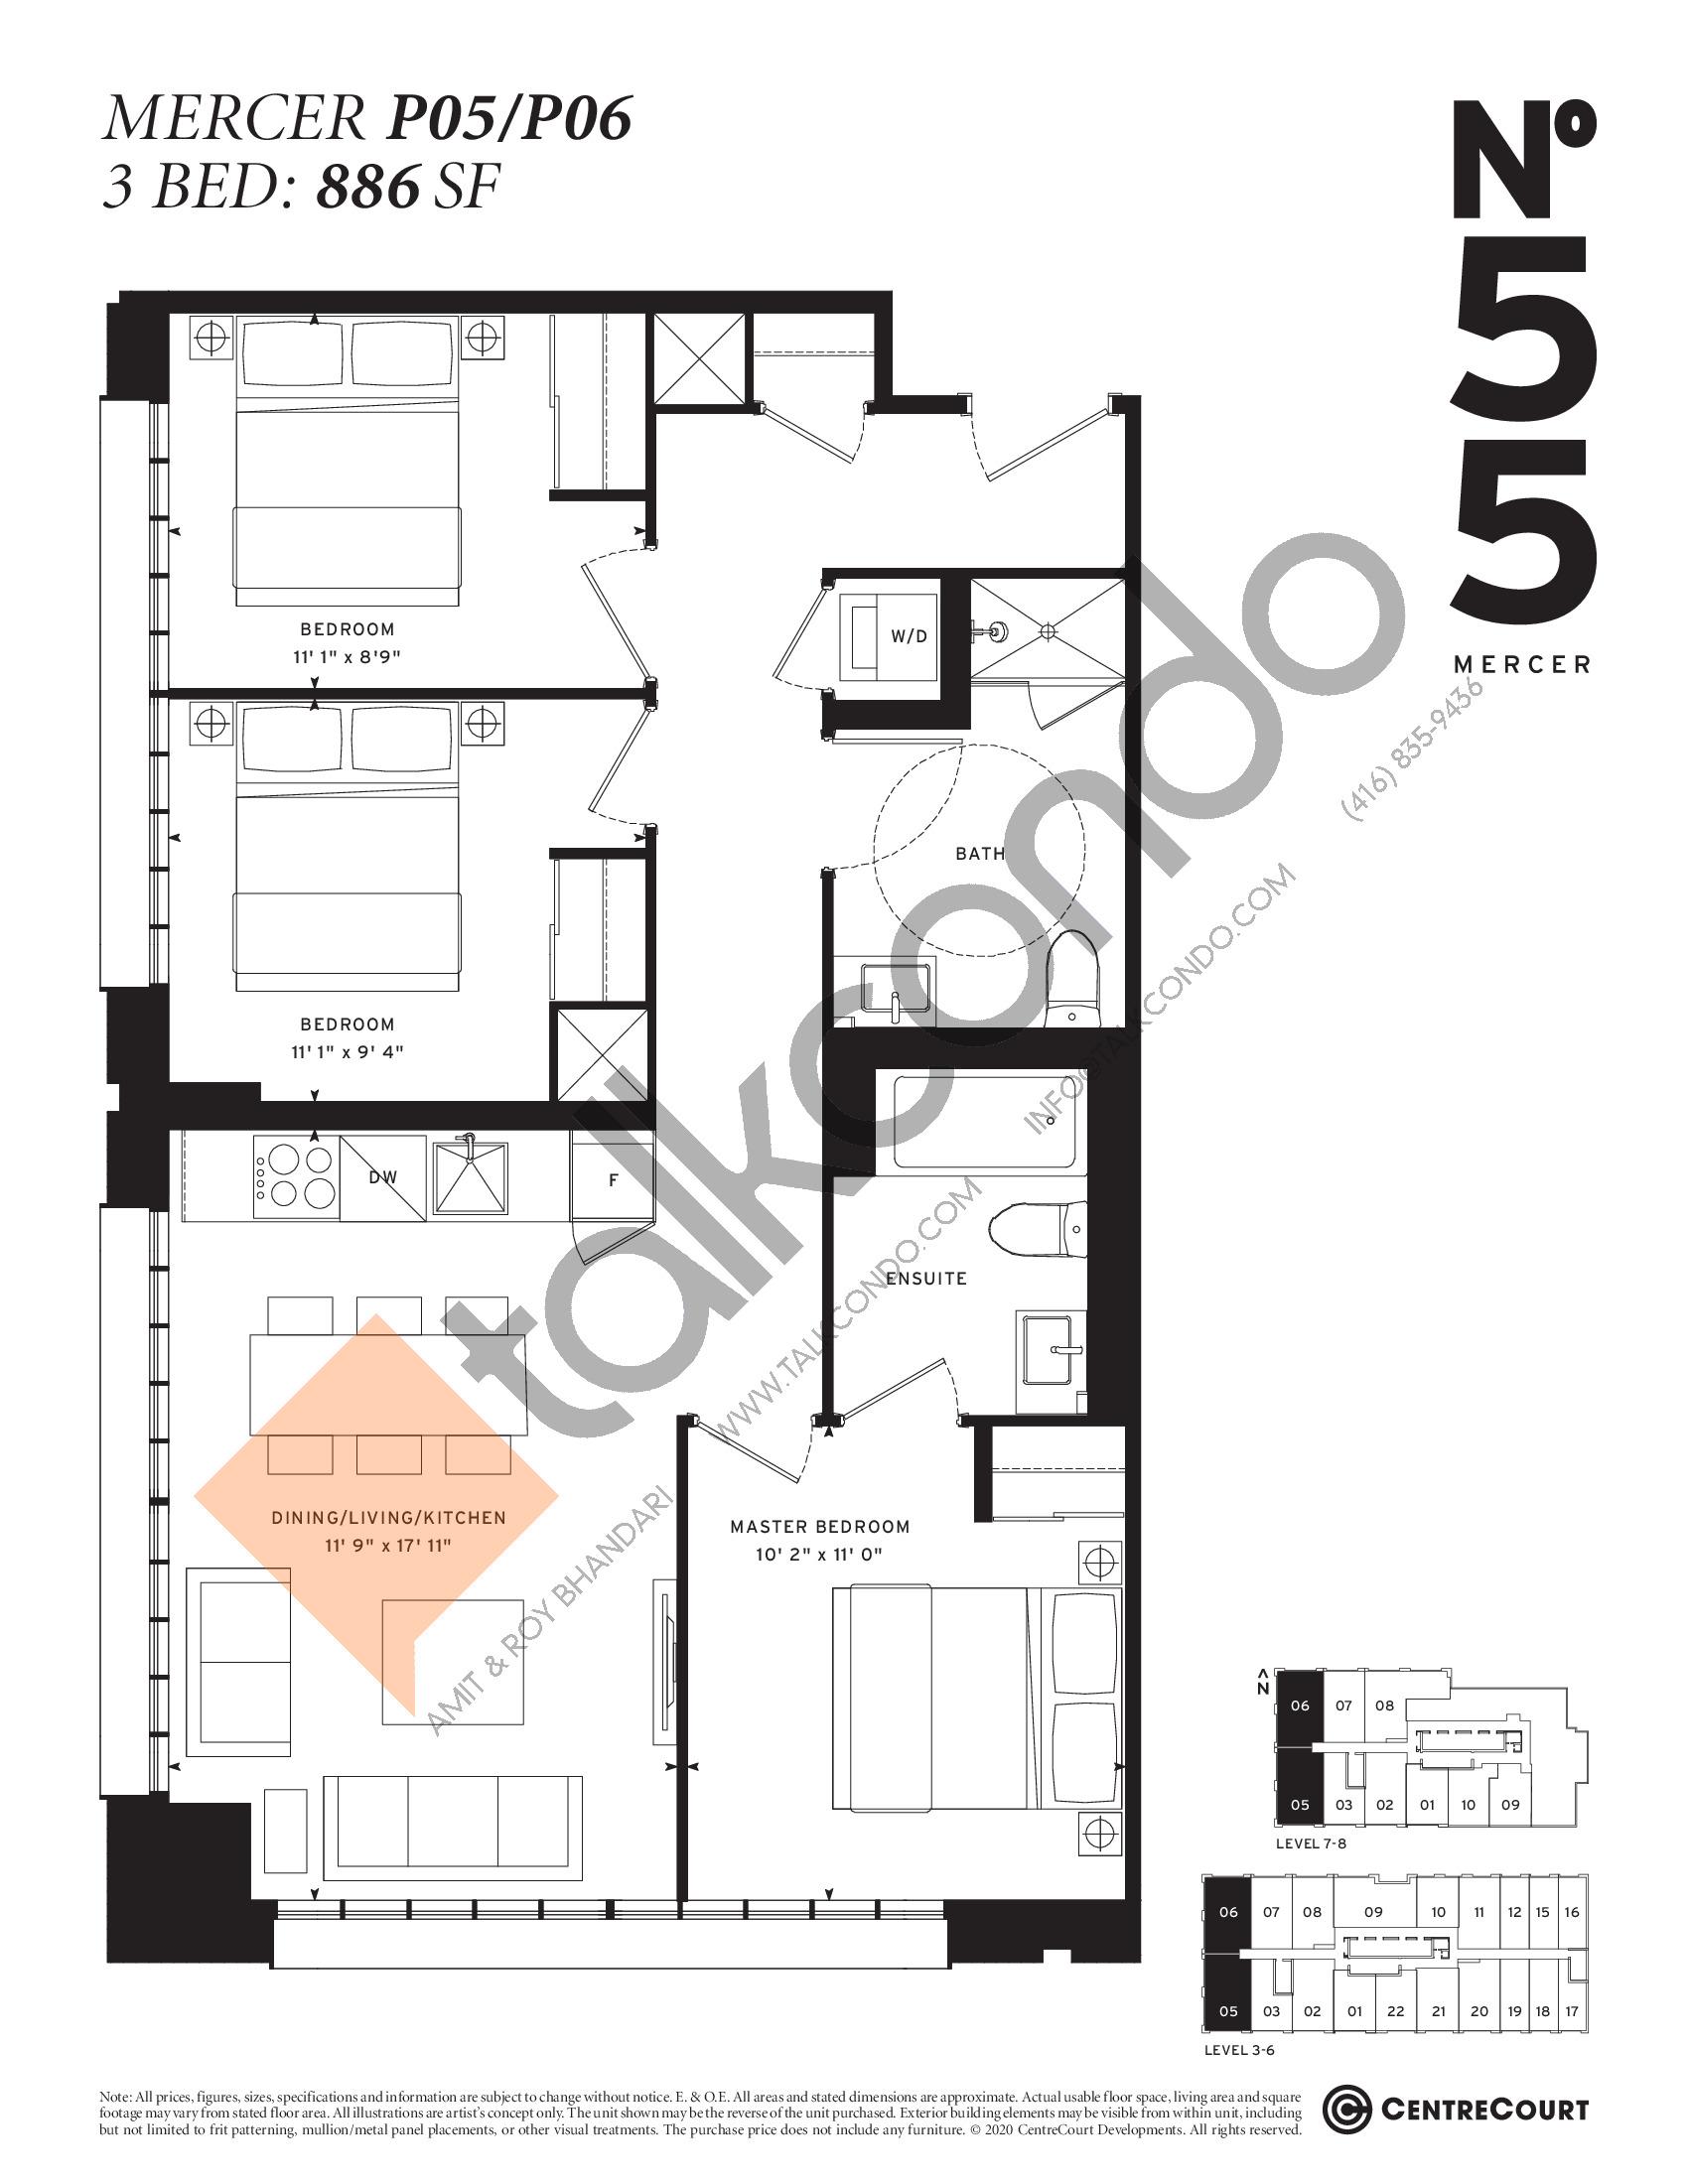 Mercer P05/P06 Floor Plan at No. 55 Mercer Condos - 886 sq.ft